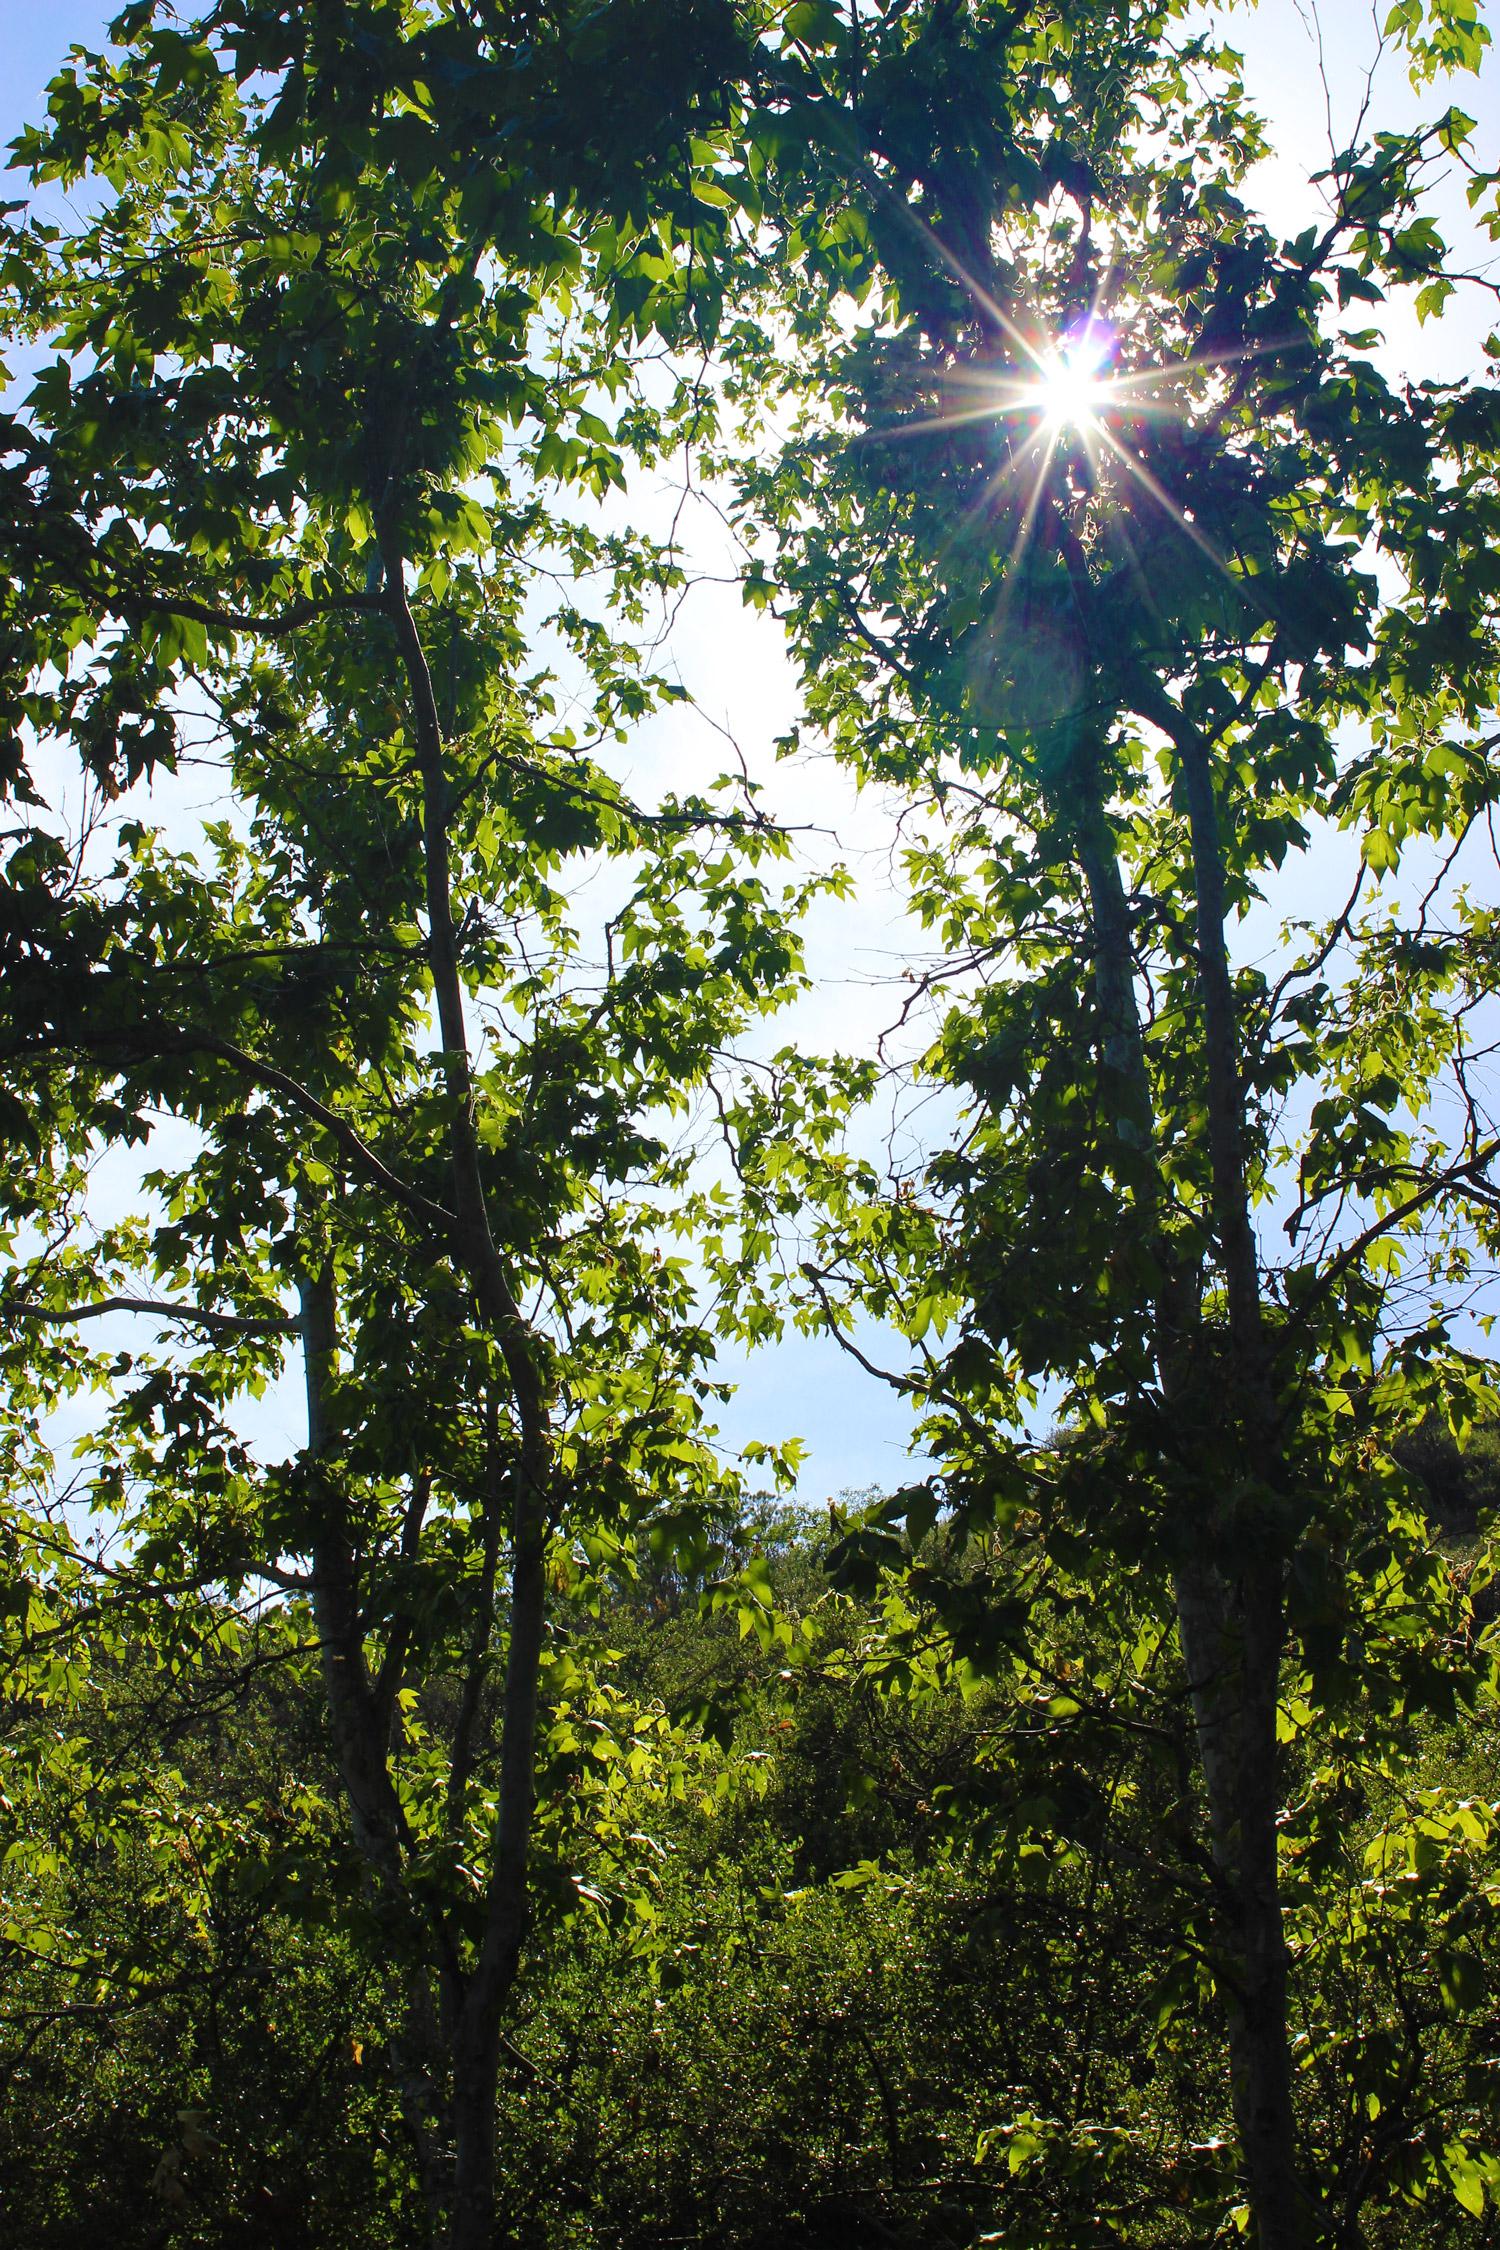 Twin trees provide refreshing shade.